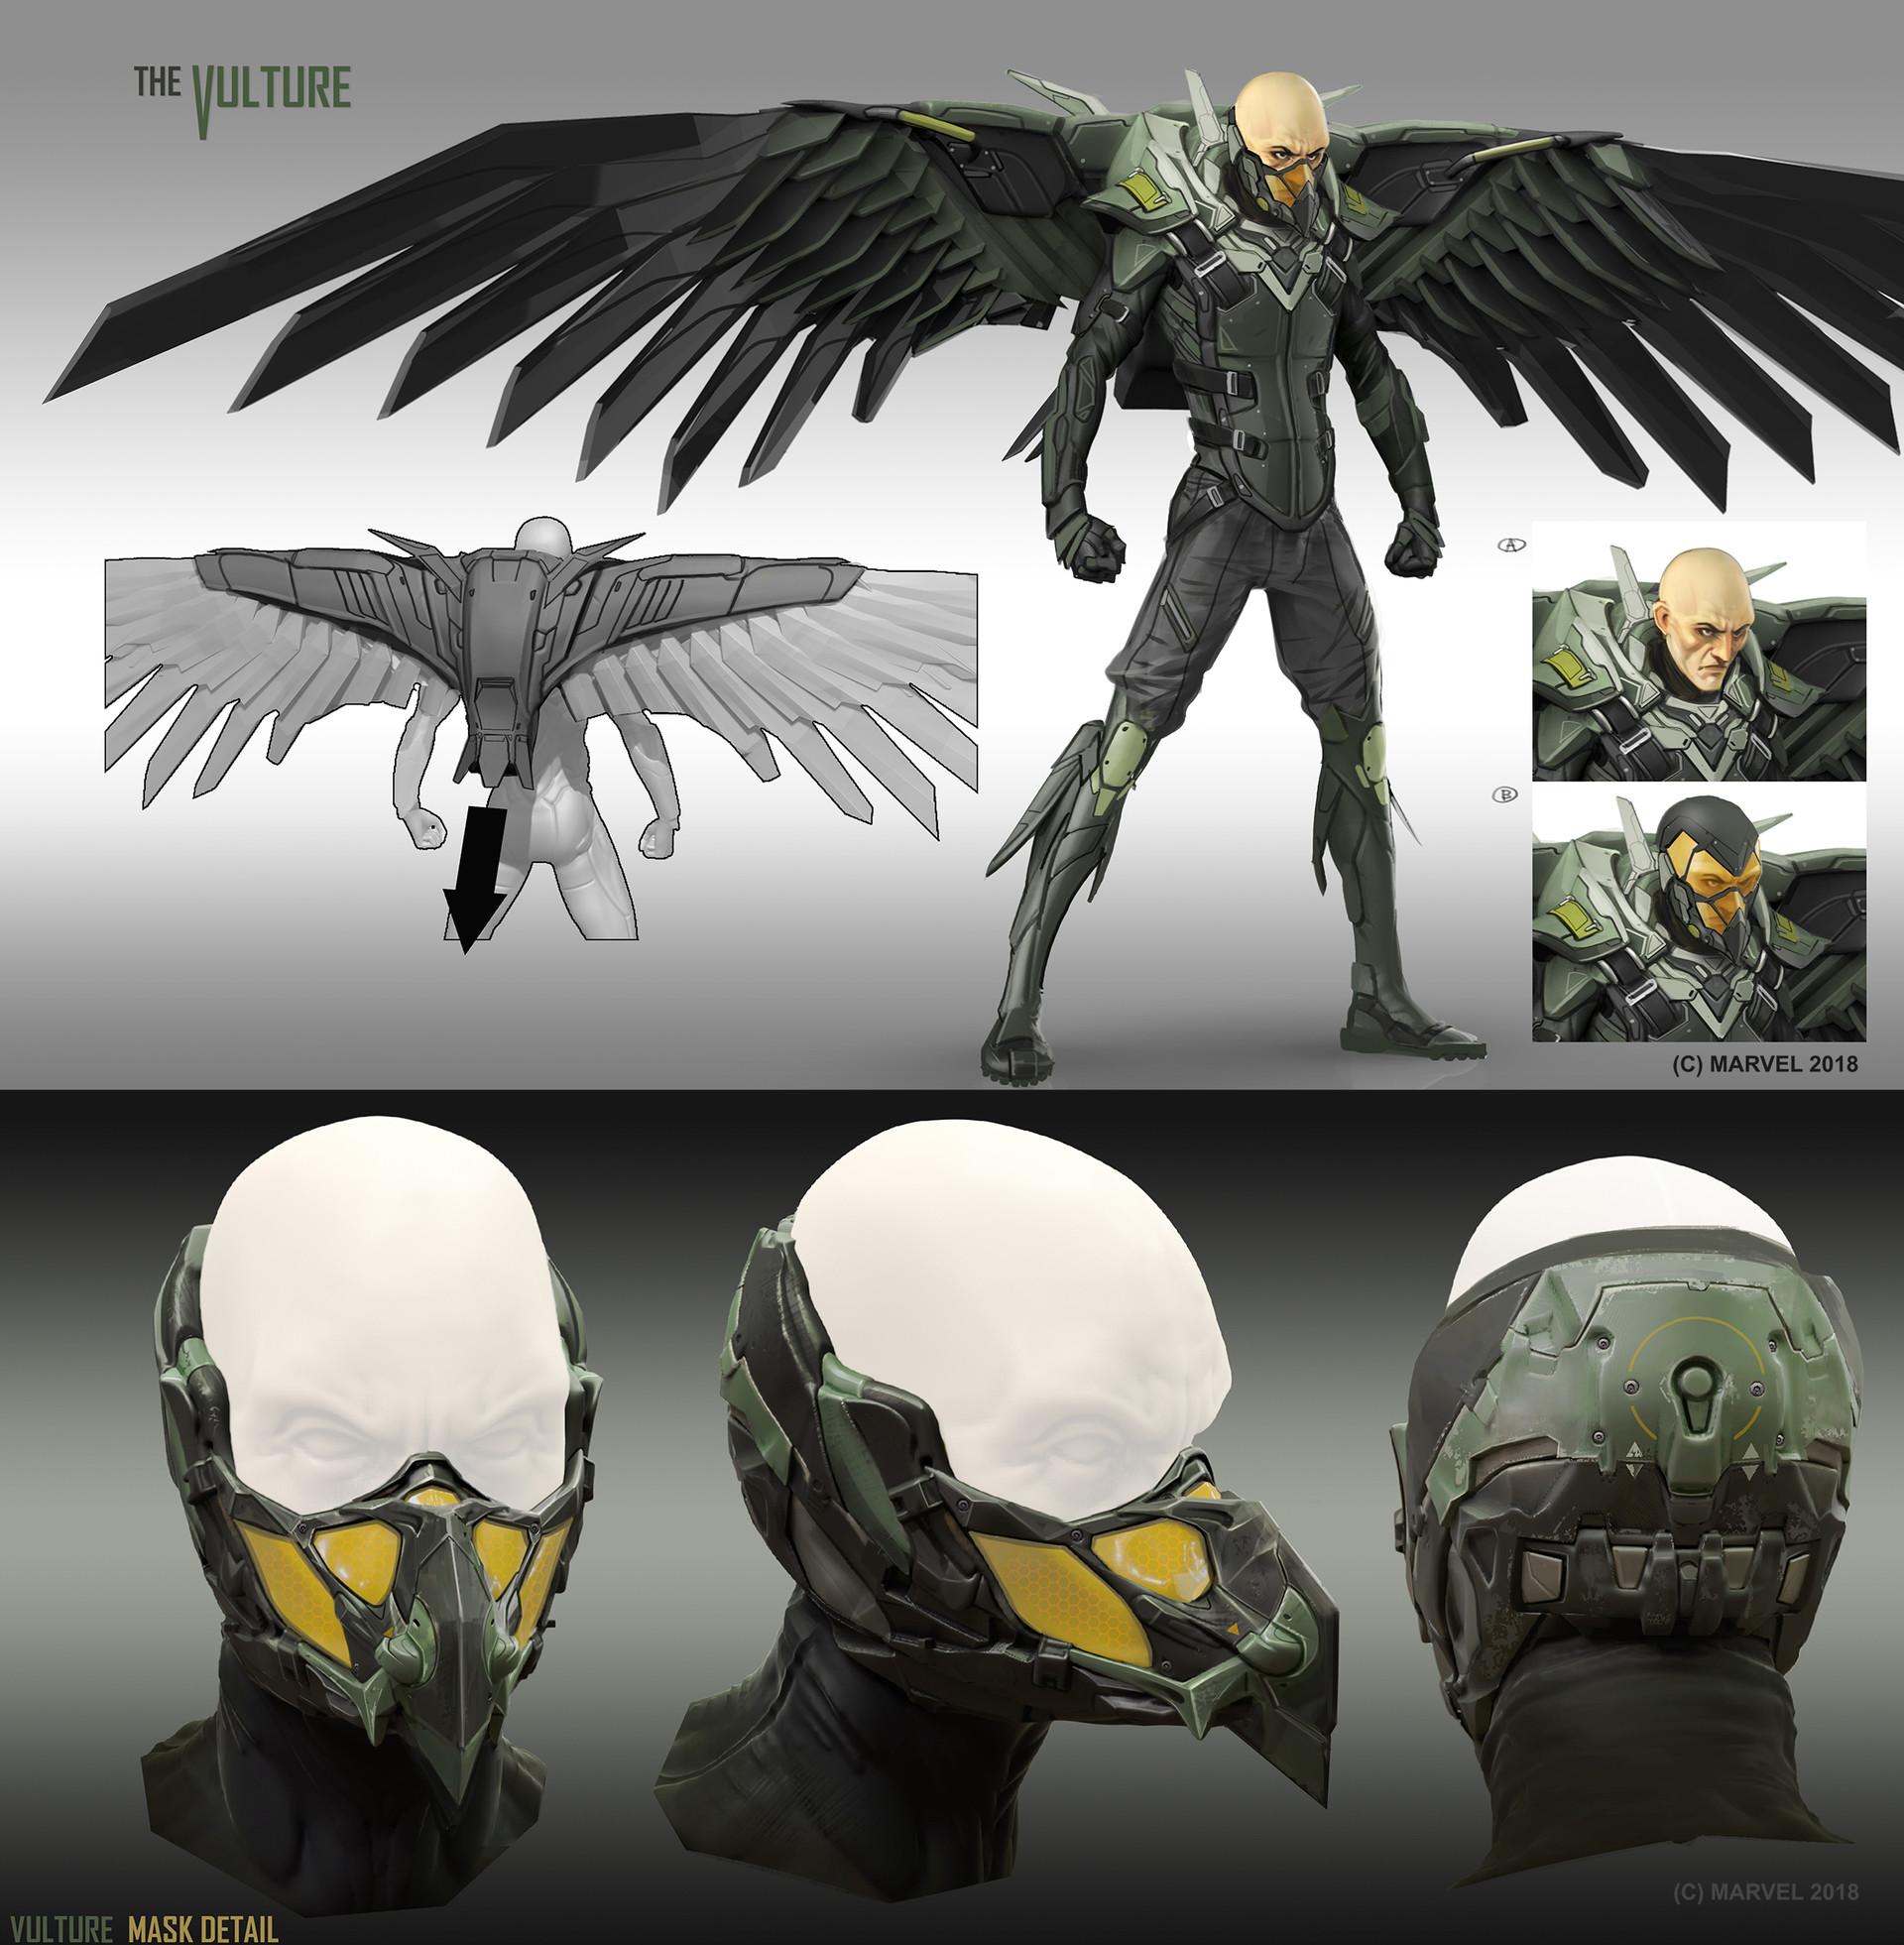 Daryl mandryk vulture update